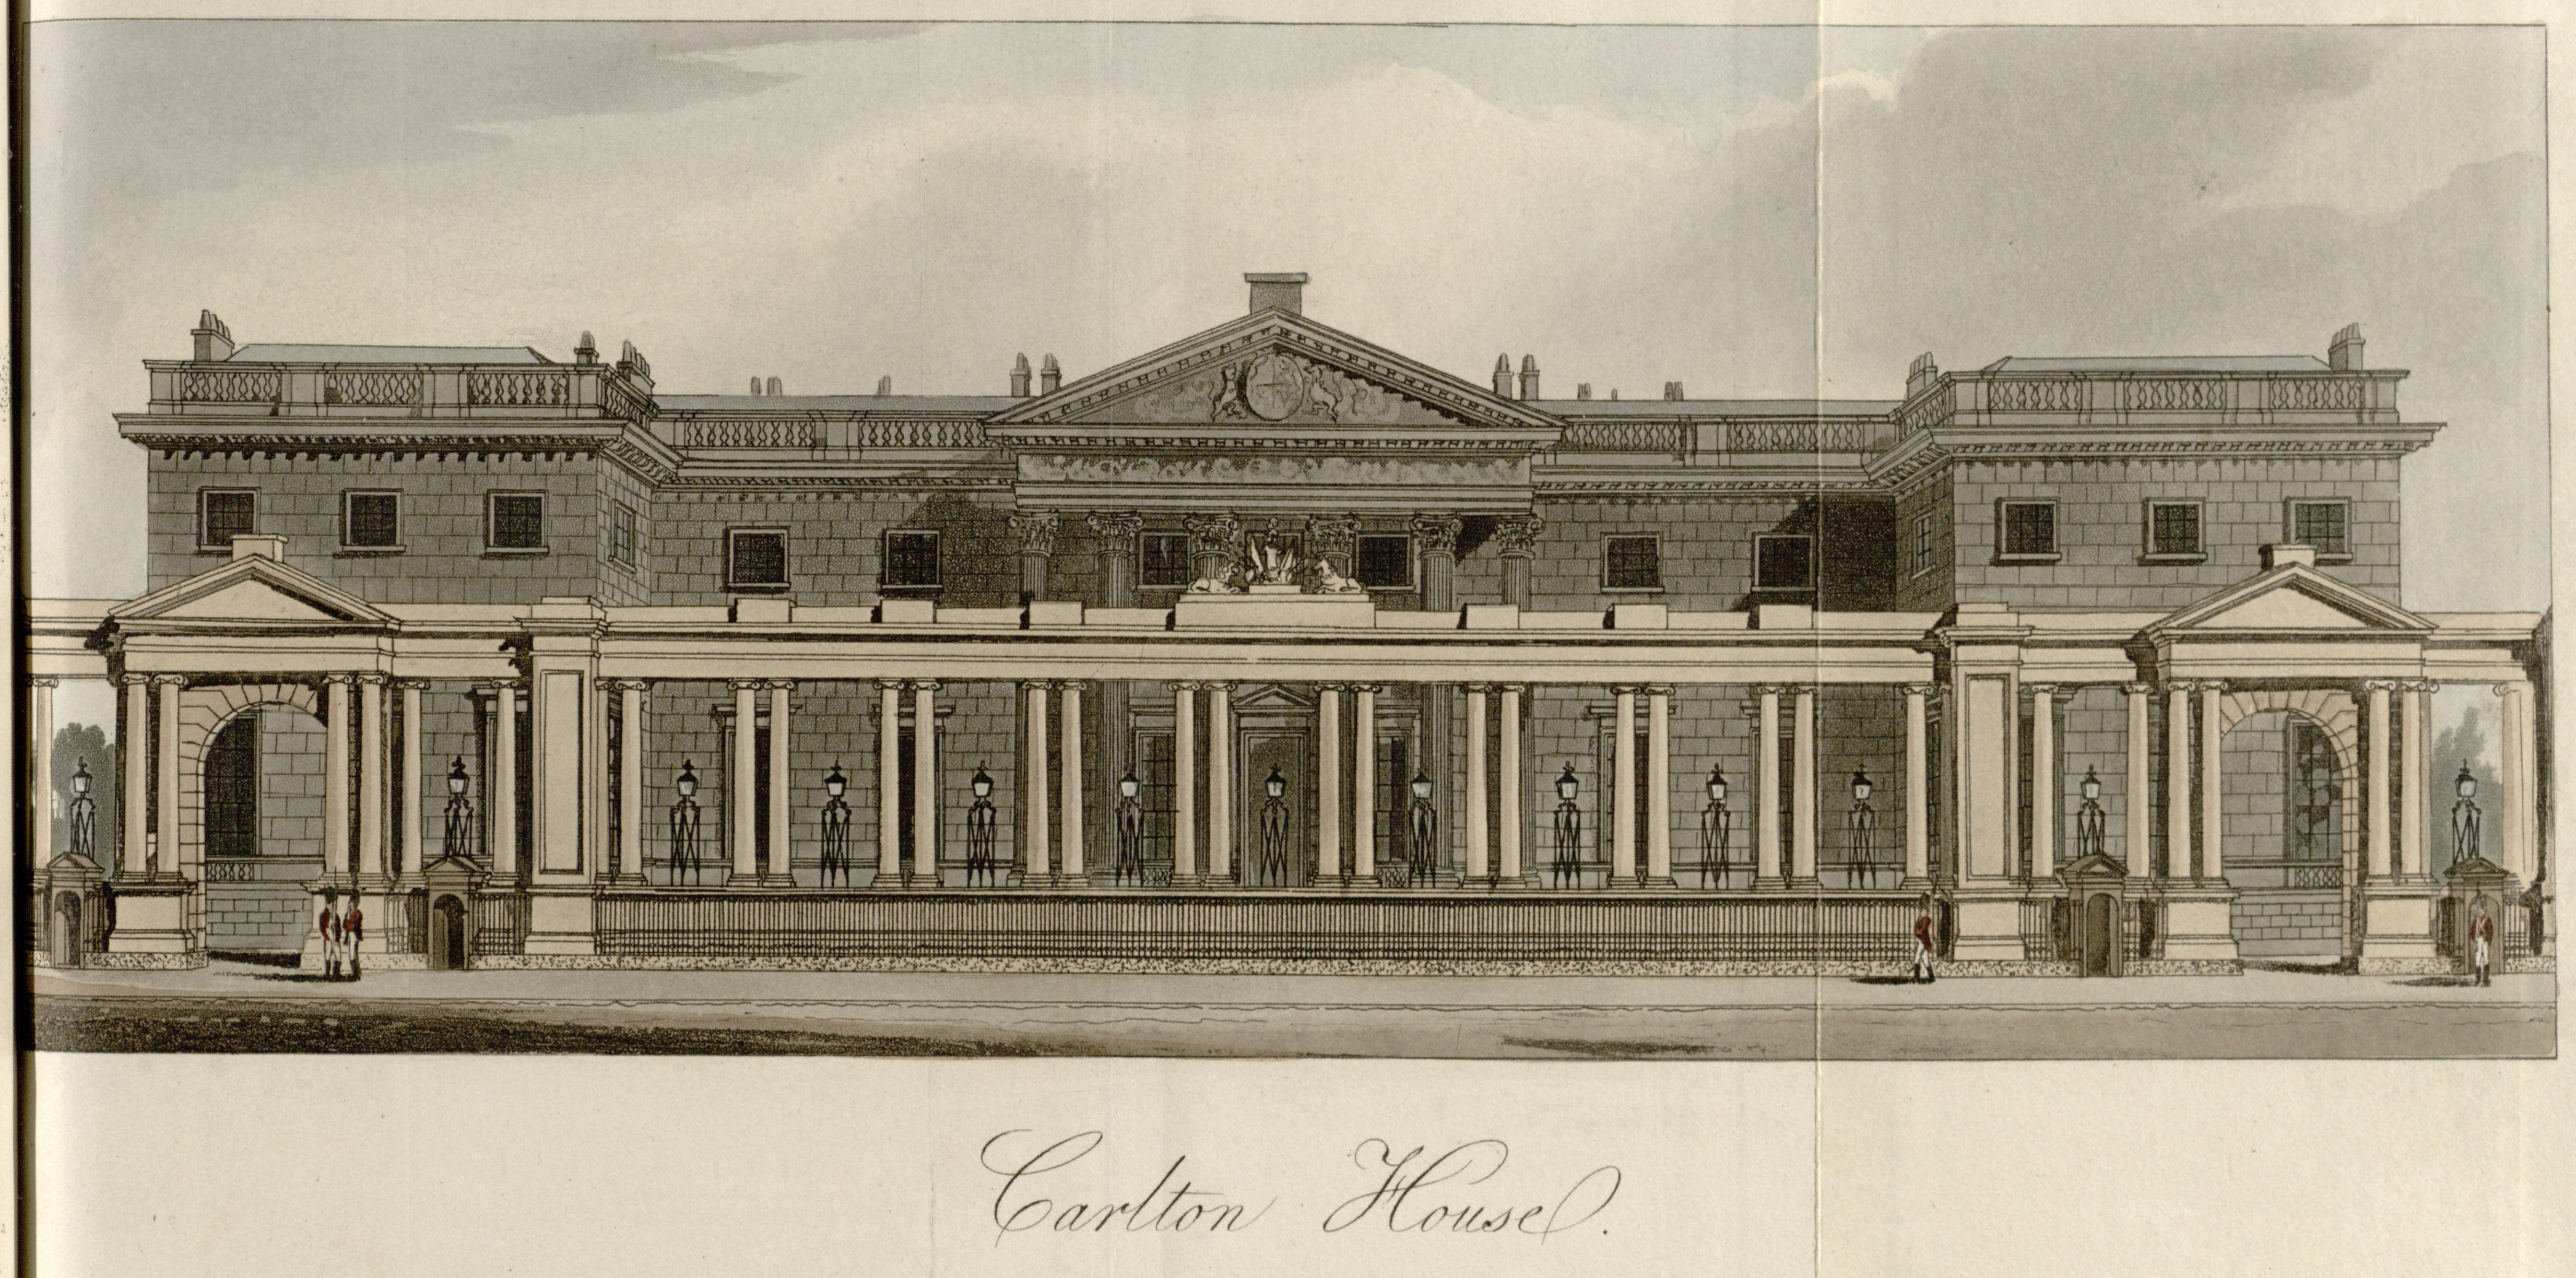 03 - Papworth - Carlton House